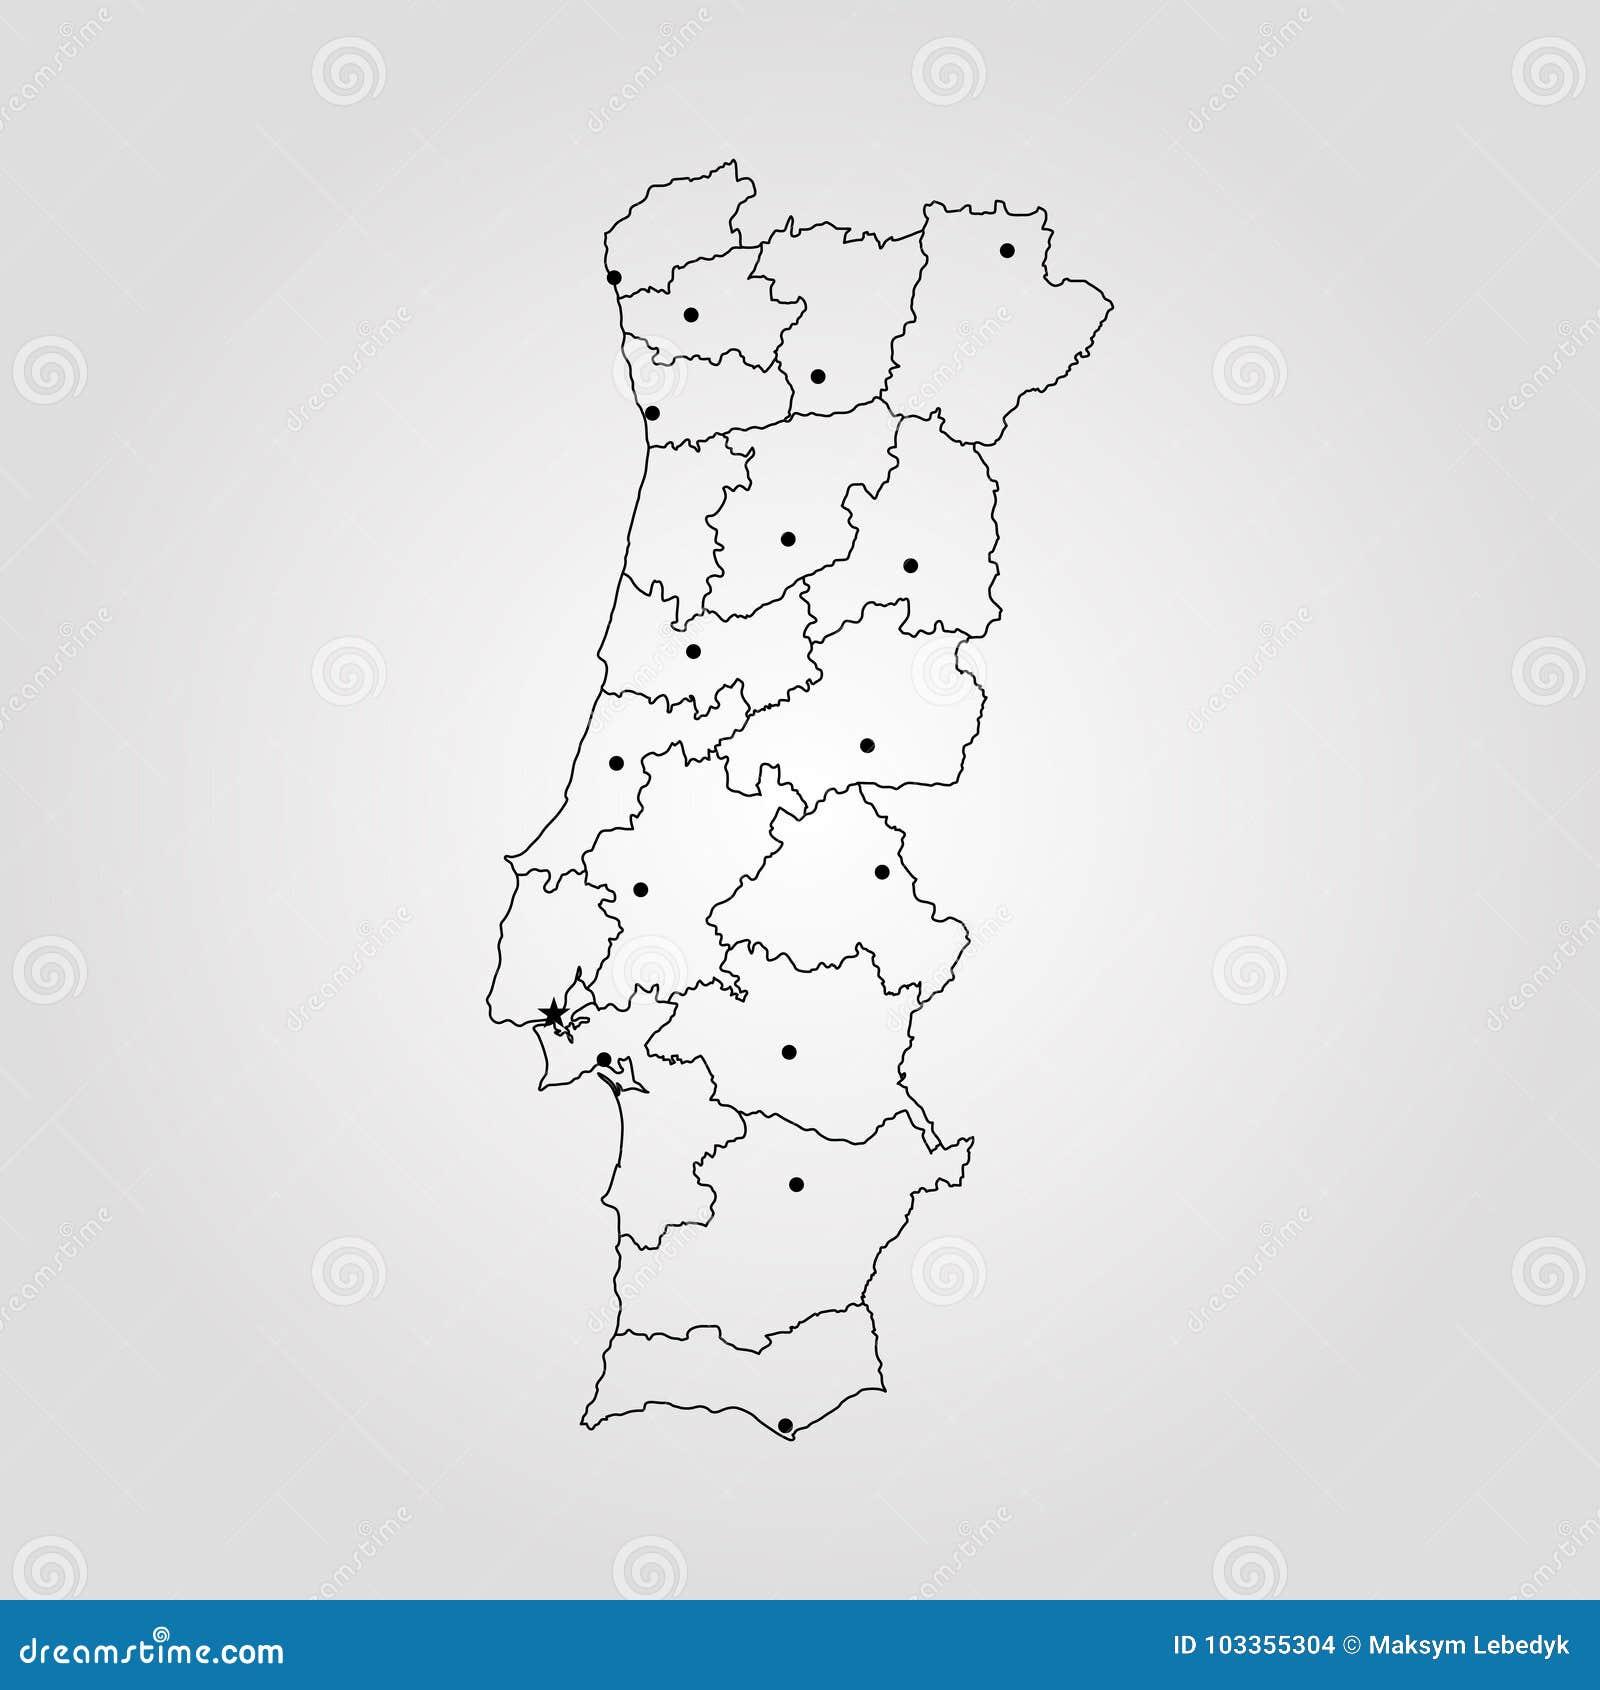 Map of Portugal stock illustration. Illustration of border - 103355304